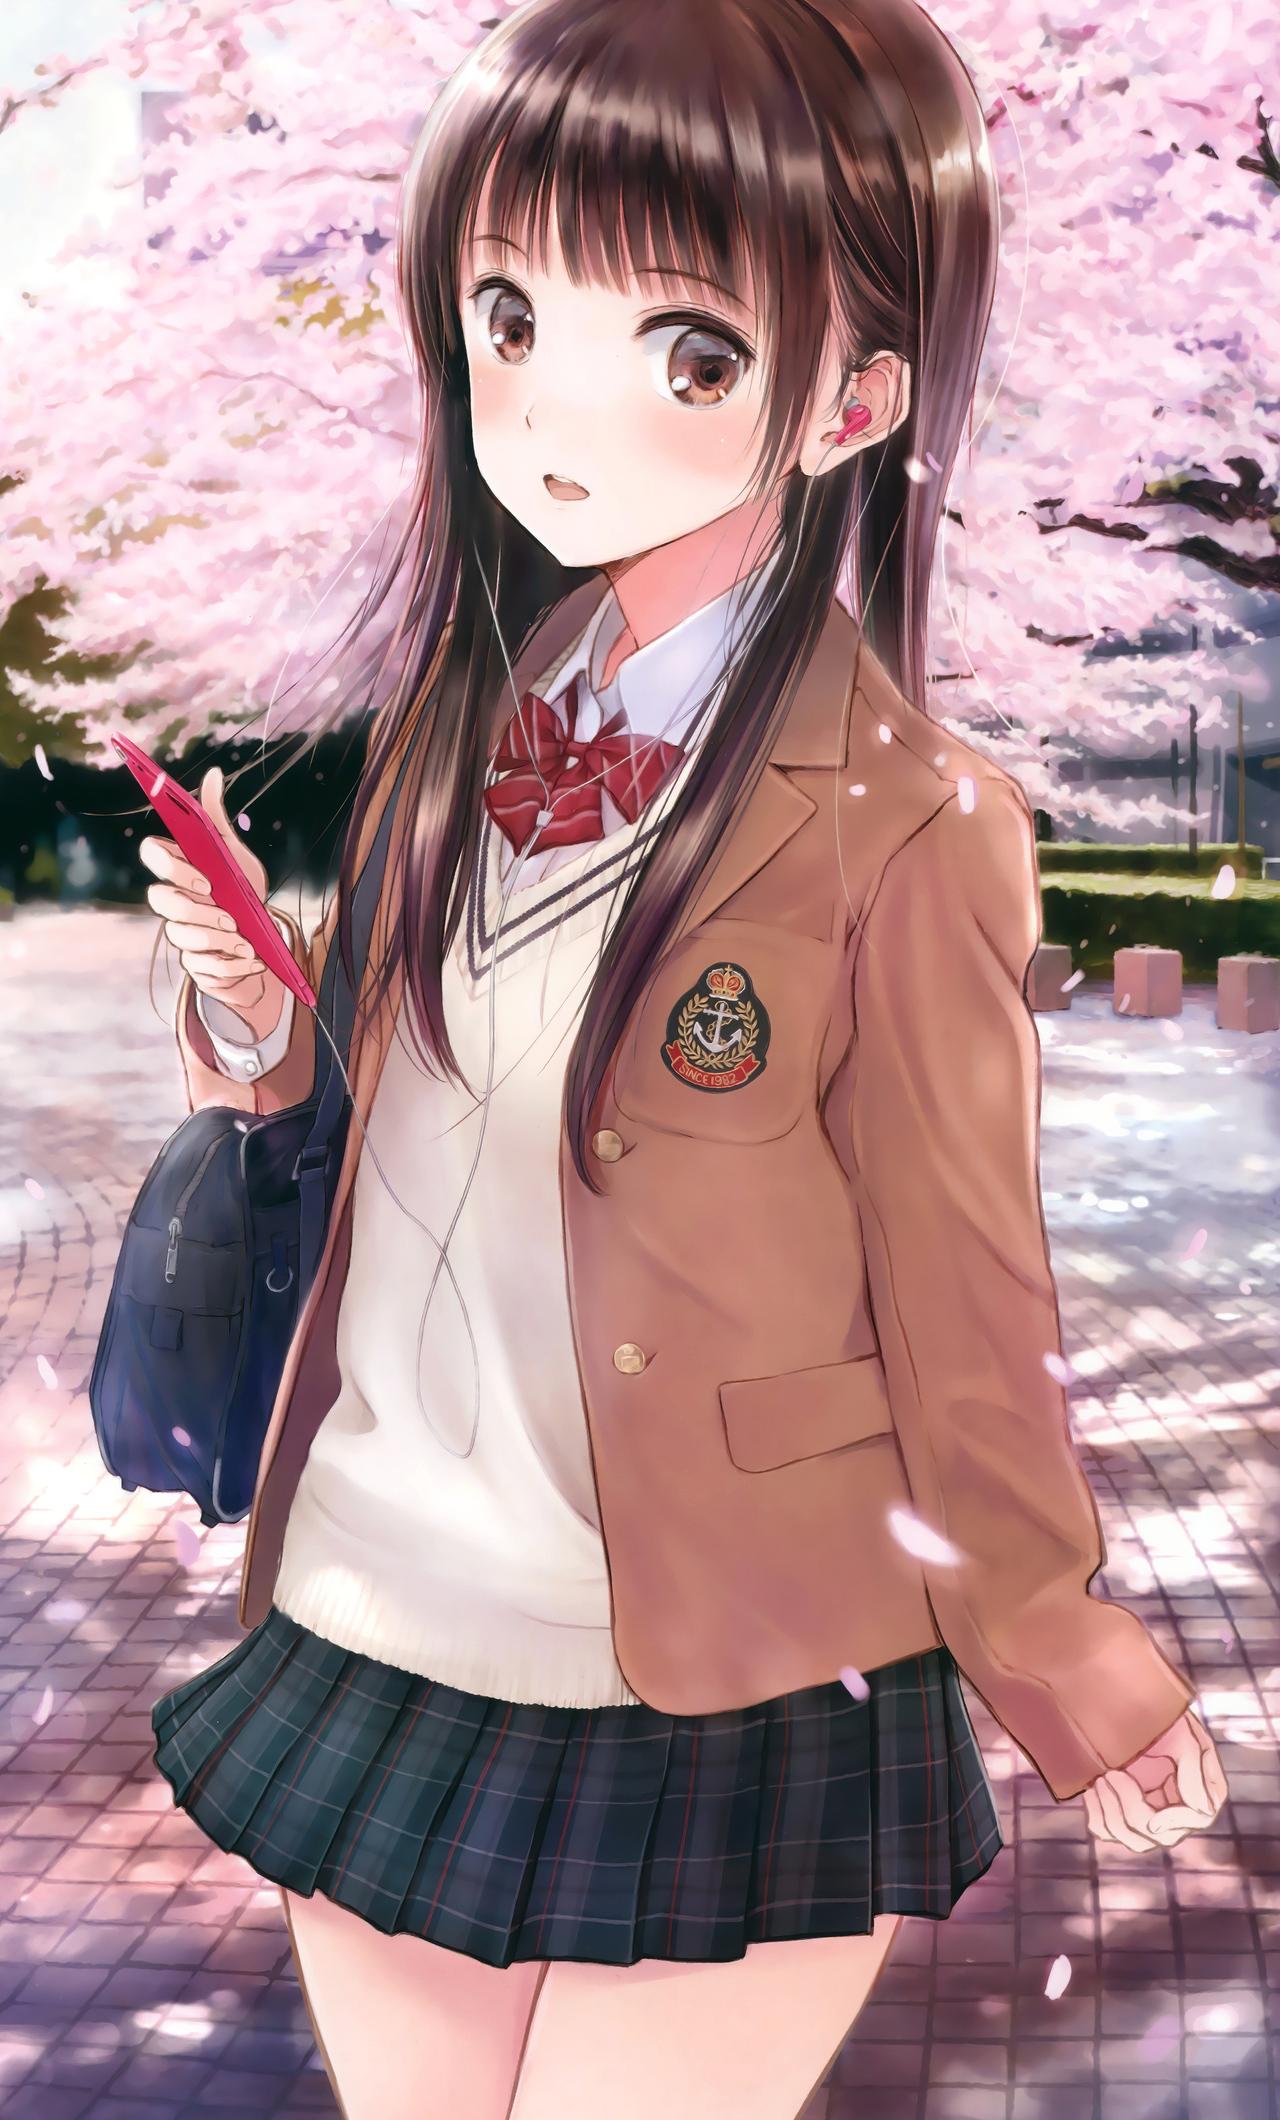 anime-cute-school-girl-p2.jpg